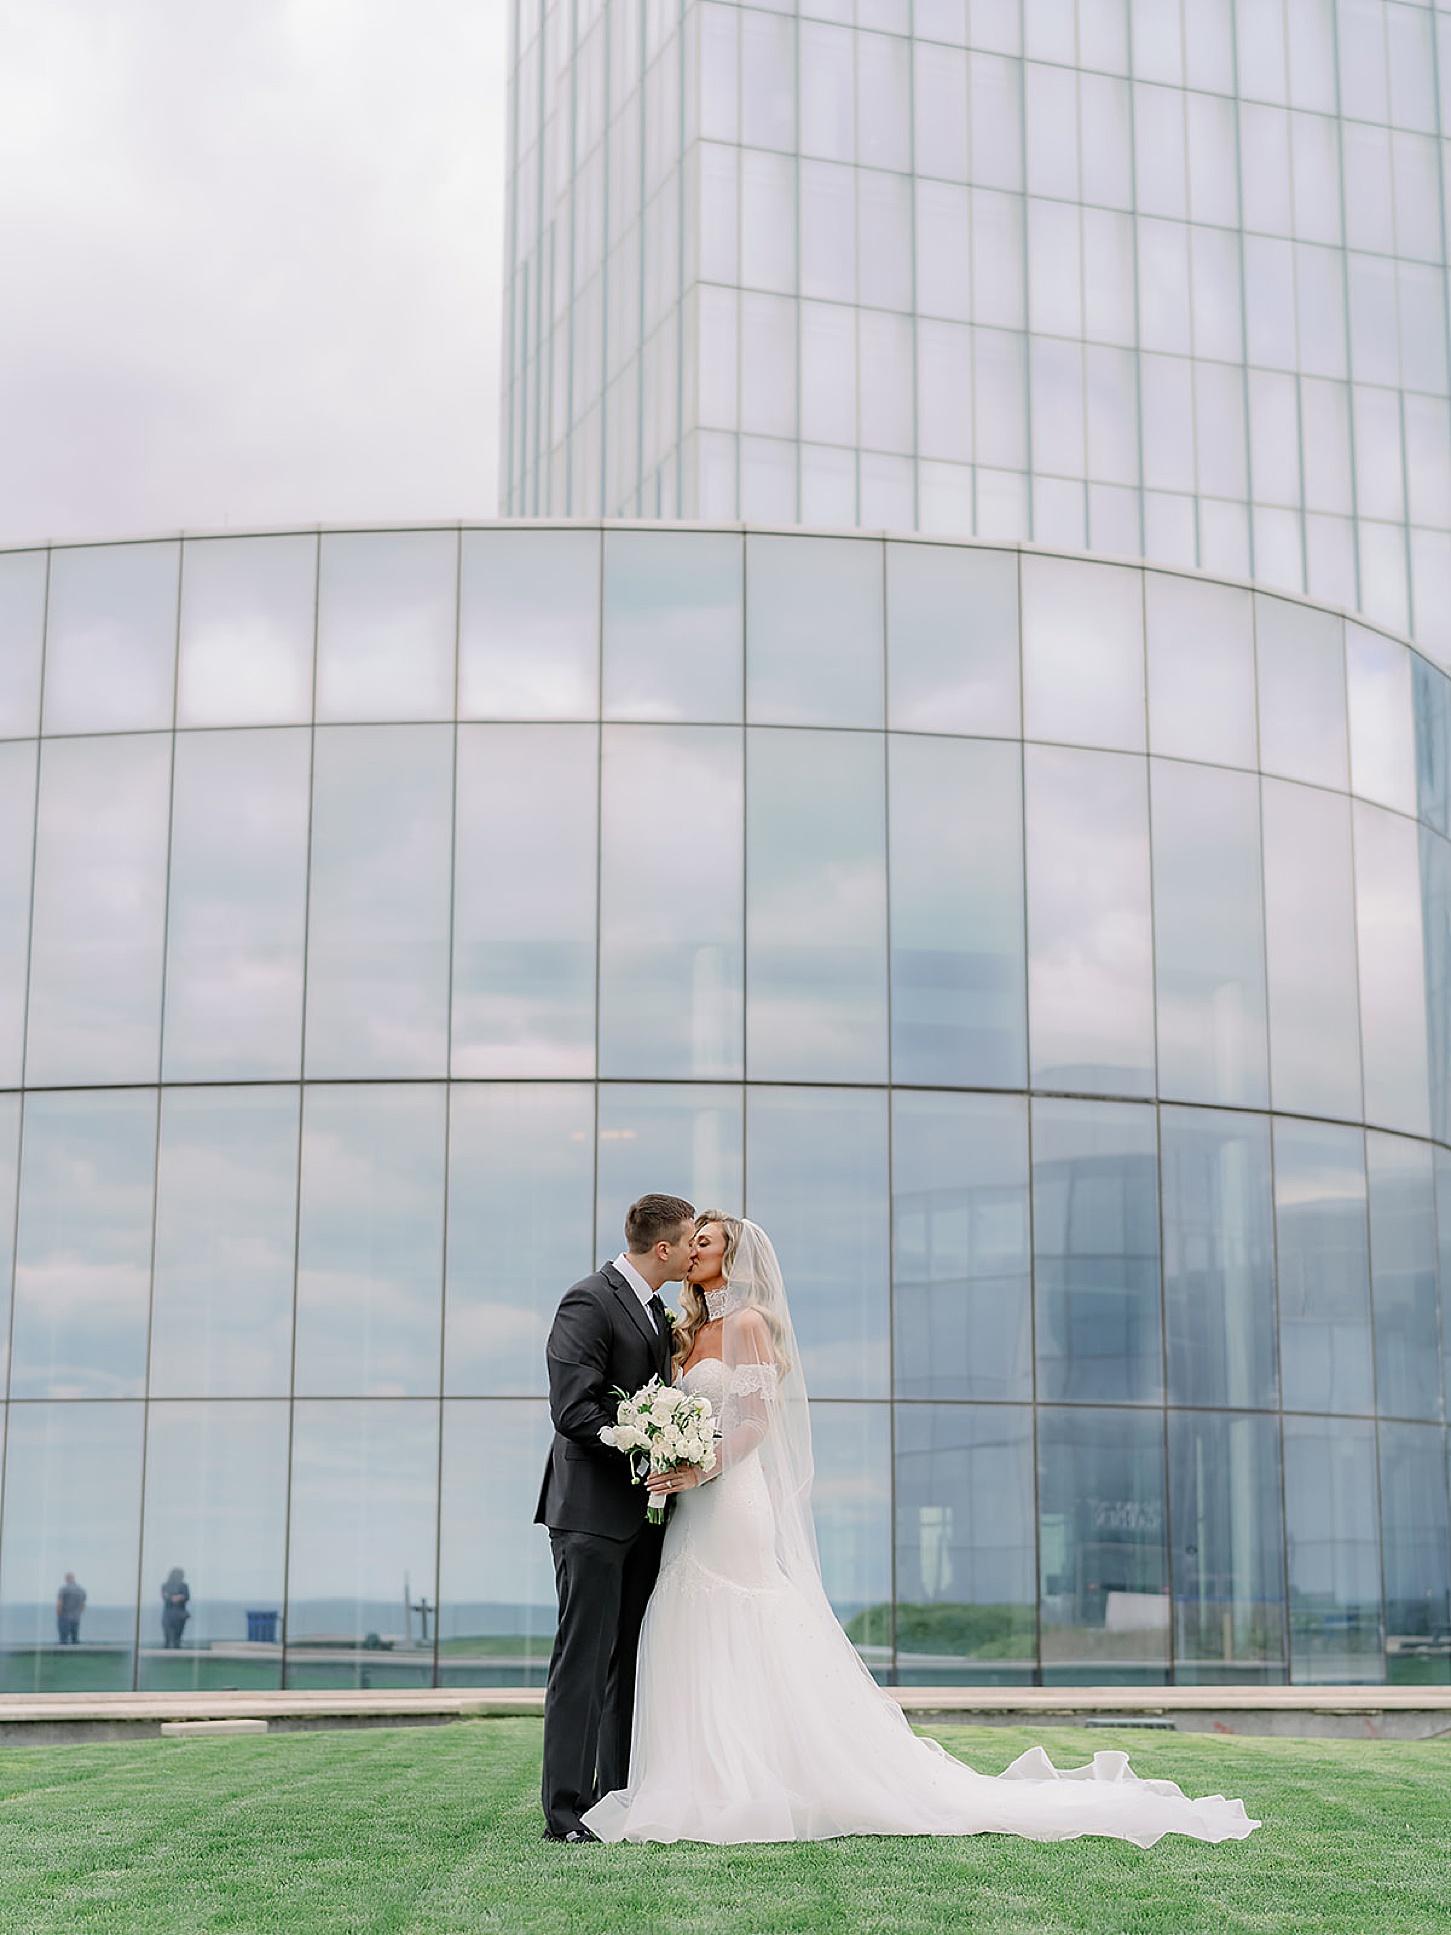 Atlantic City Wedding Photography Studio by Magdalena Studios Lexy Cha 0068